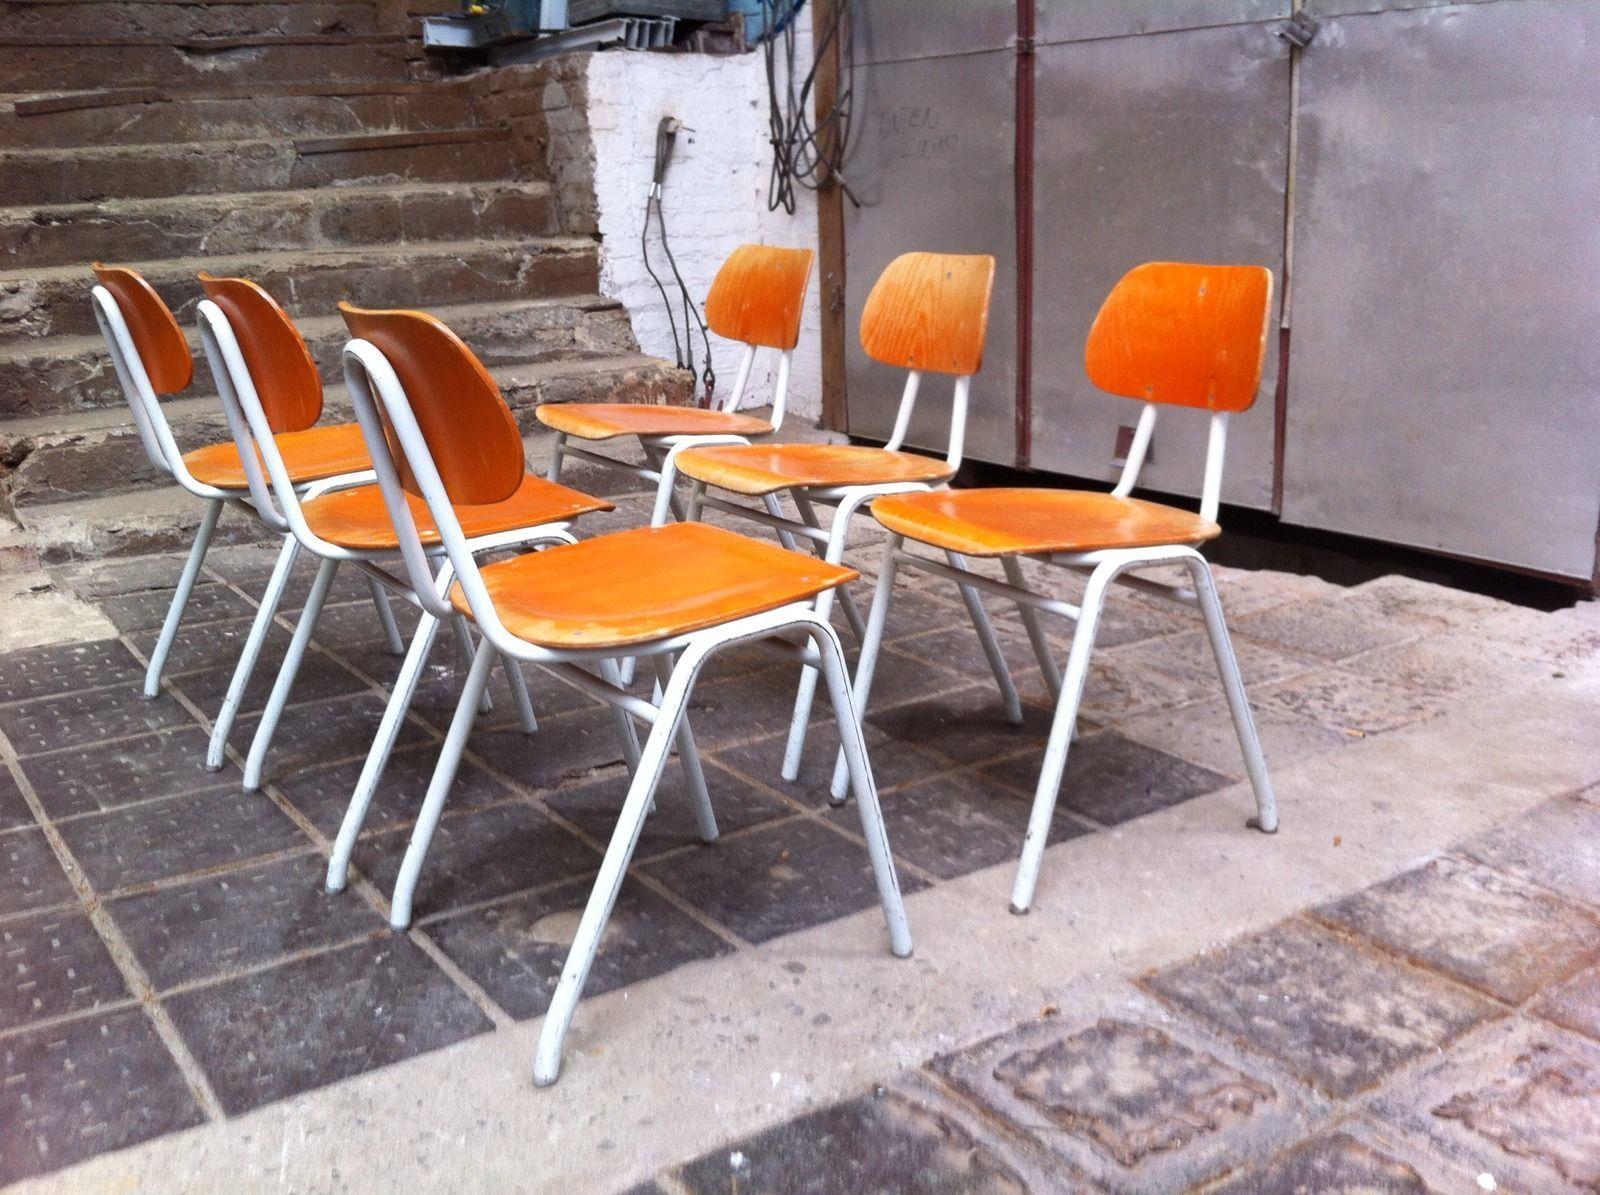 Antiquitäten & Kunst Mobiliar & Interieur Einfach Industrial Stahlrohrstühle Stuhl Stapelstuhl Loft Bauhaus